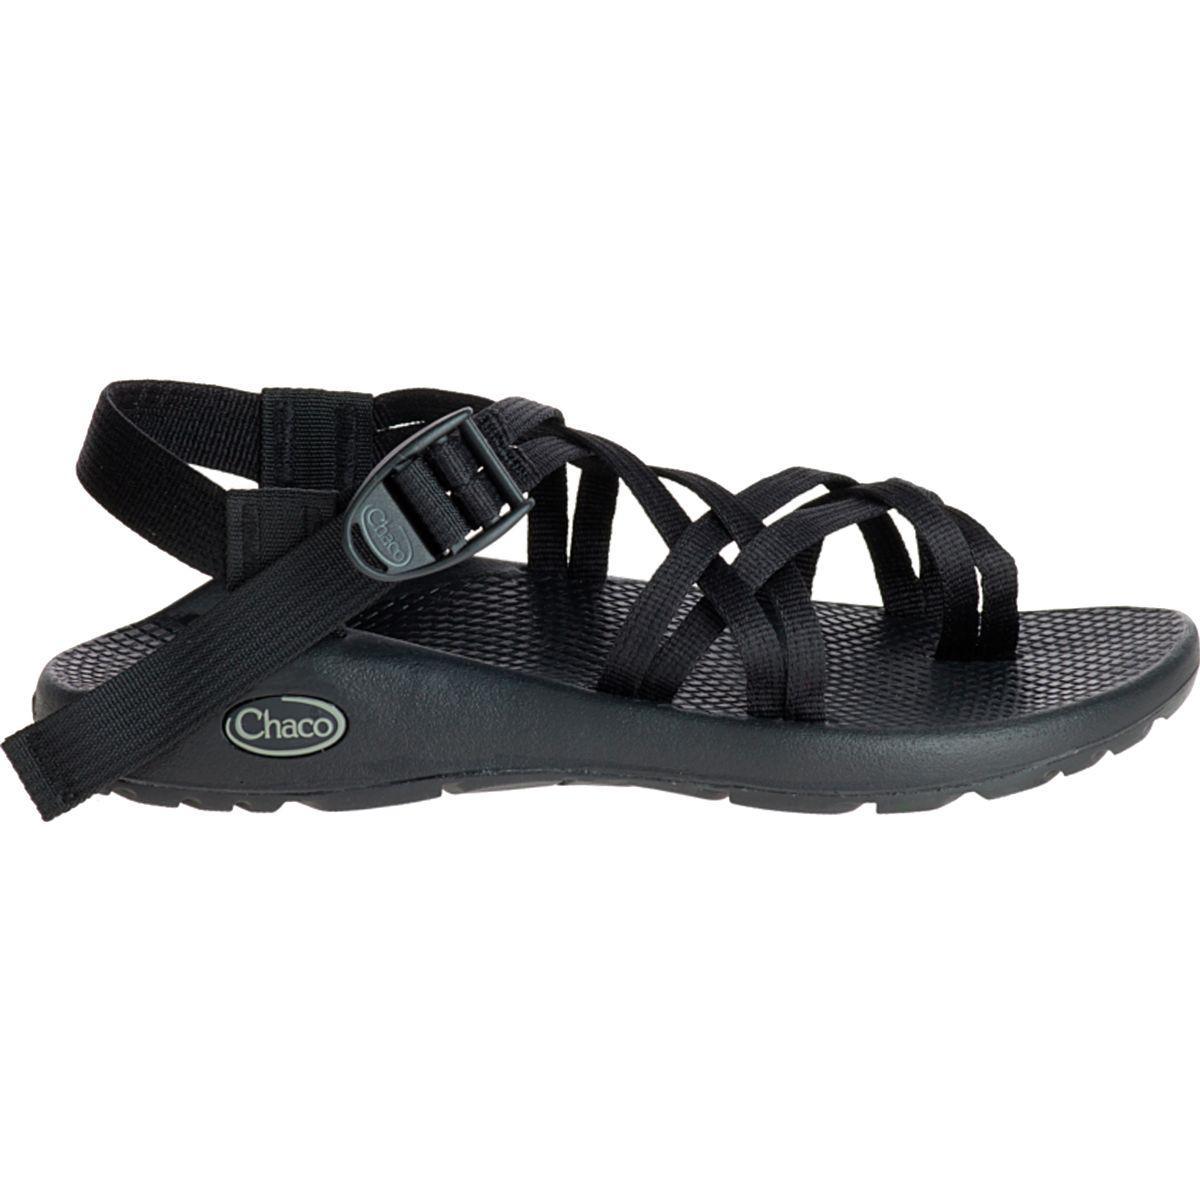 Cape Robbin OMH 2 Sandal Open Toe Comfort Pull On Beach BLACK